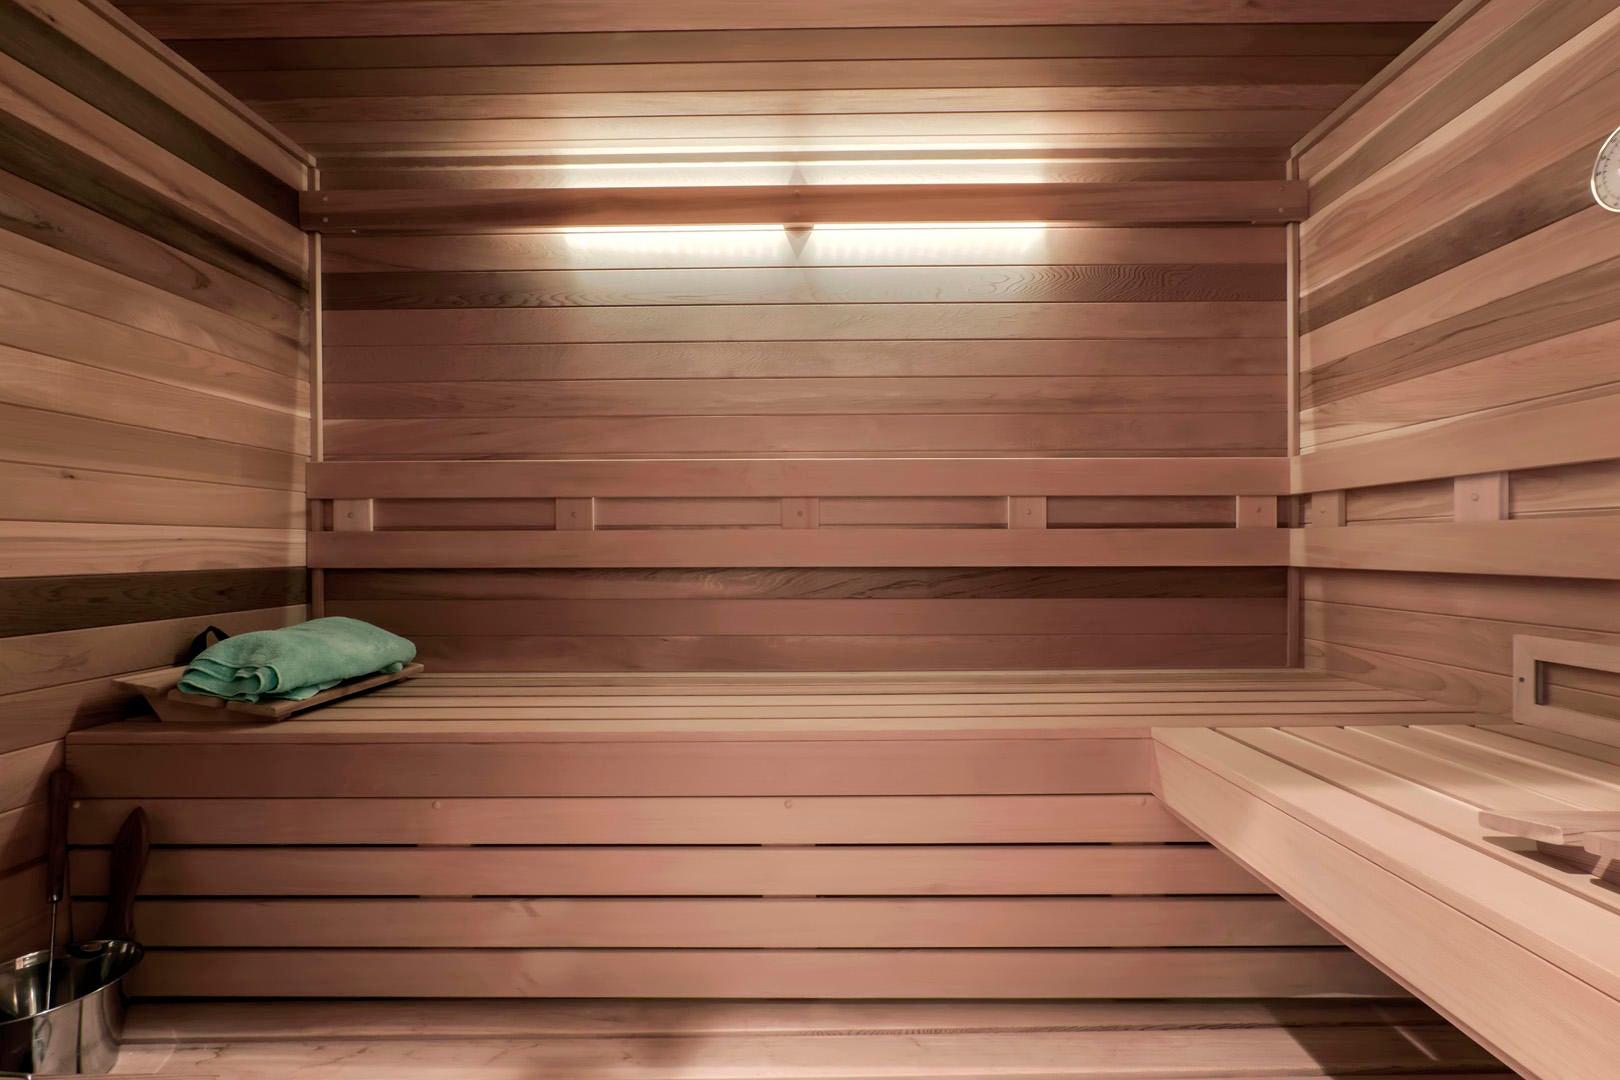 34_WrenCourt_211_Sauna